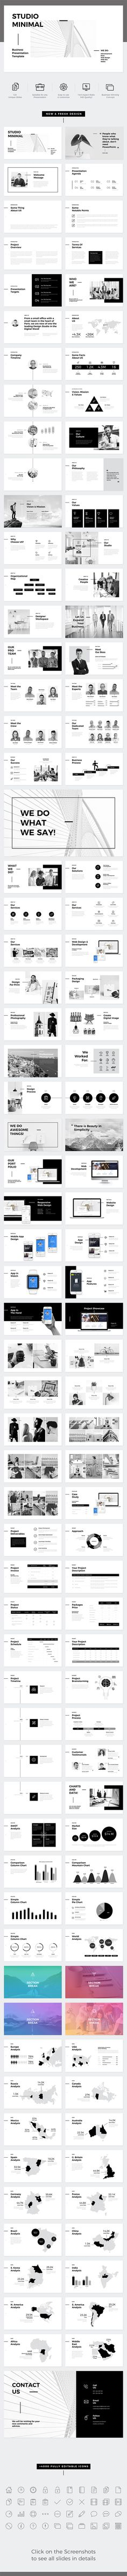 Studio Minimal Presentation Google Slides Template  company profile - presentation - powerpoint - keynote - projection - creative presentation - projection - simple - black & white - minimal presentation